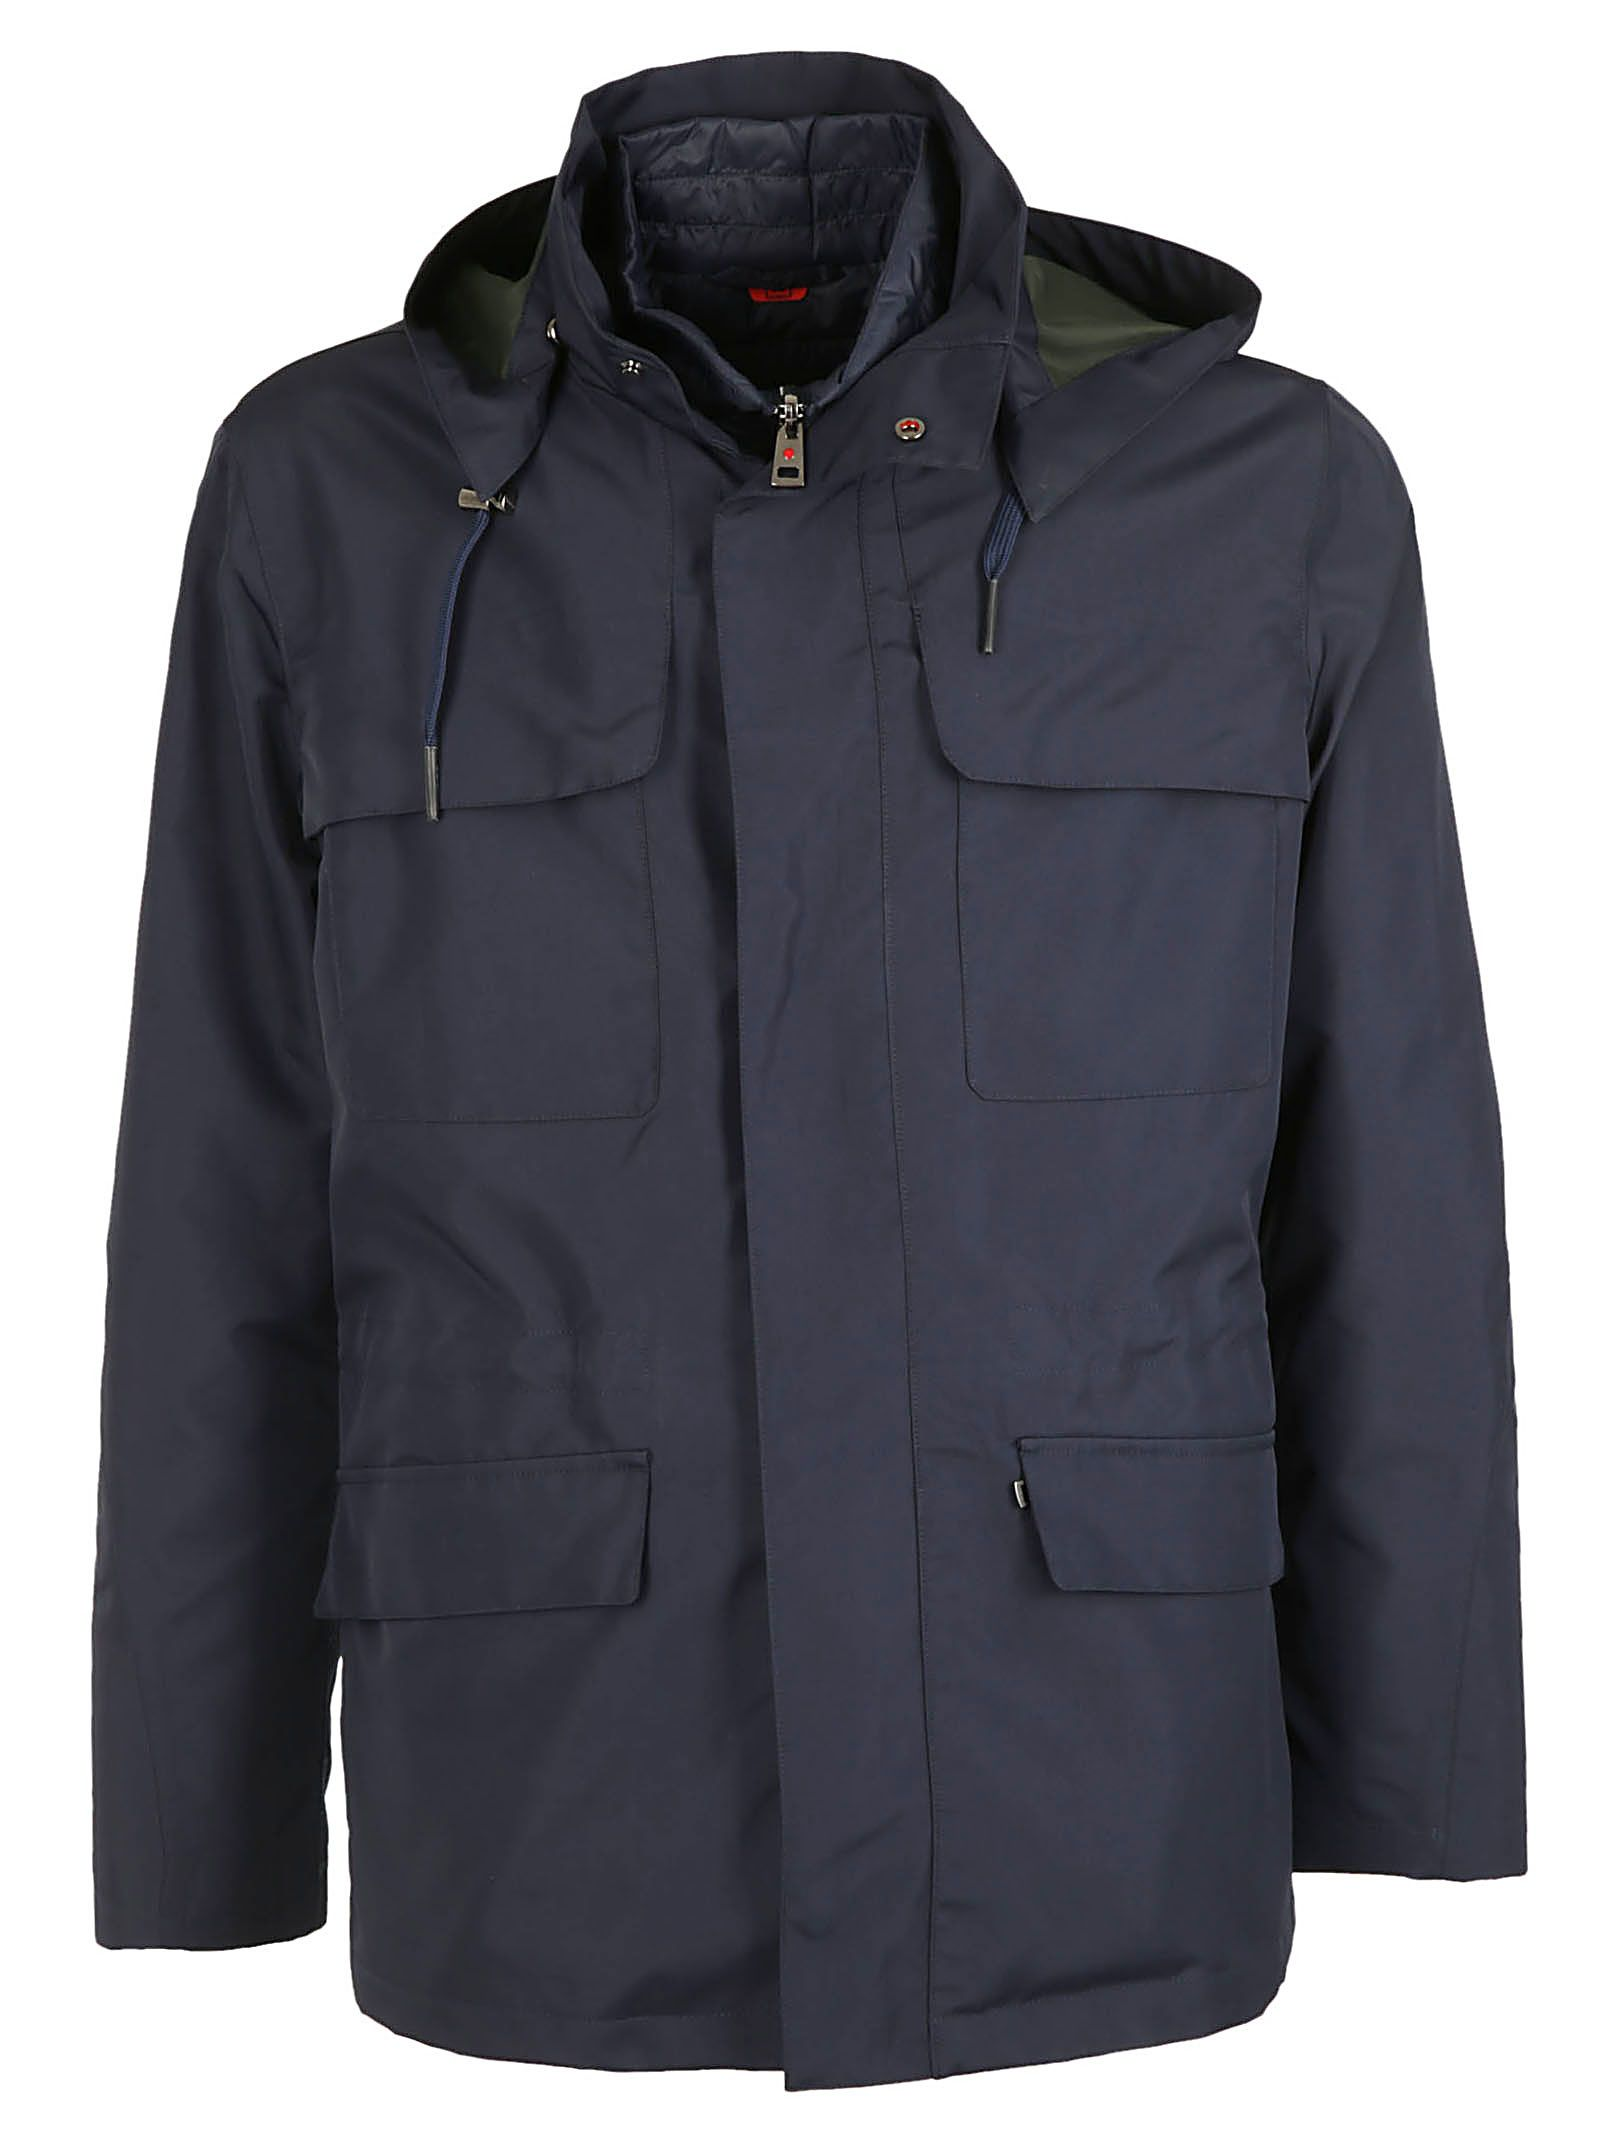 KIRED Zipped Coat in Blu/Verde